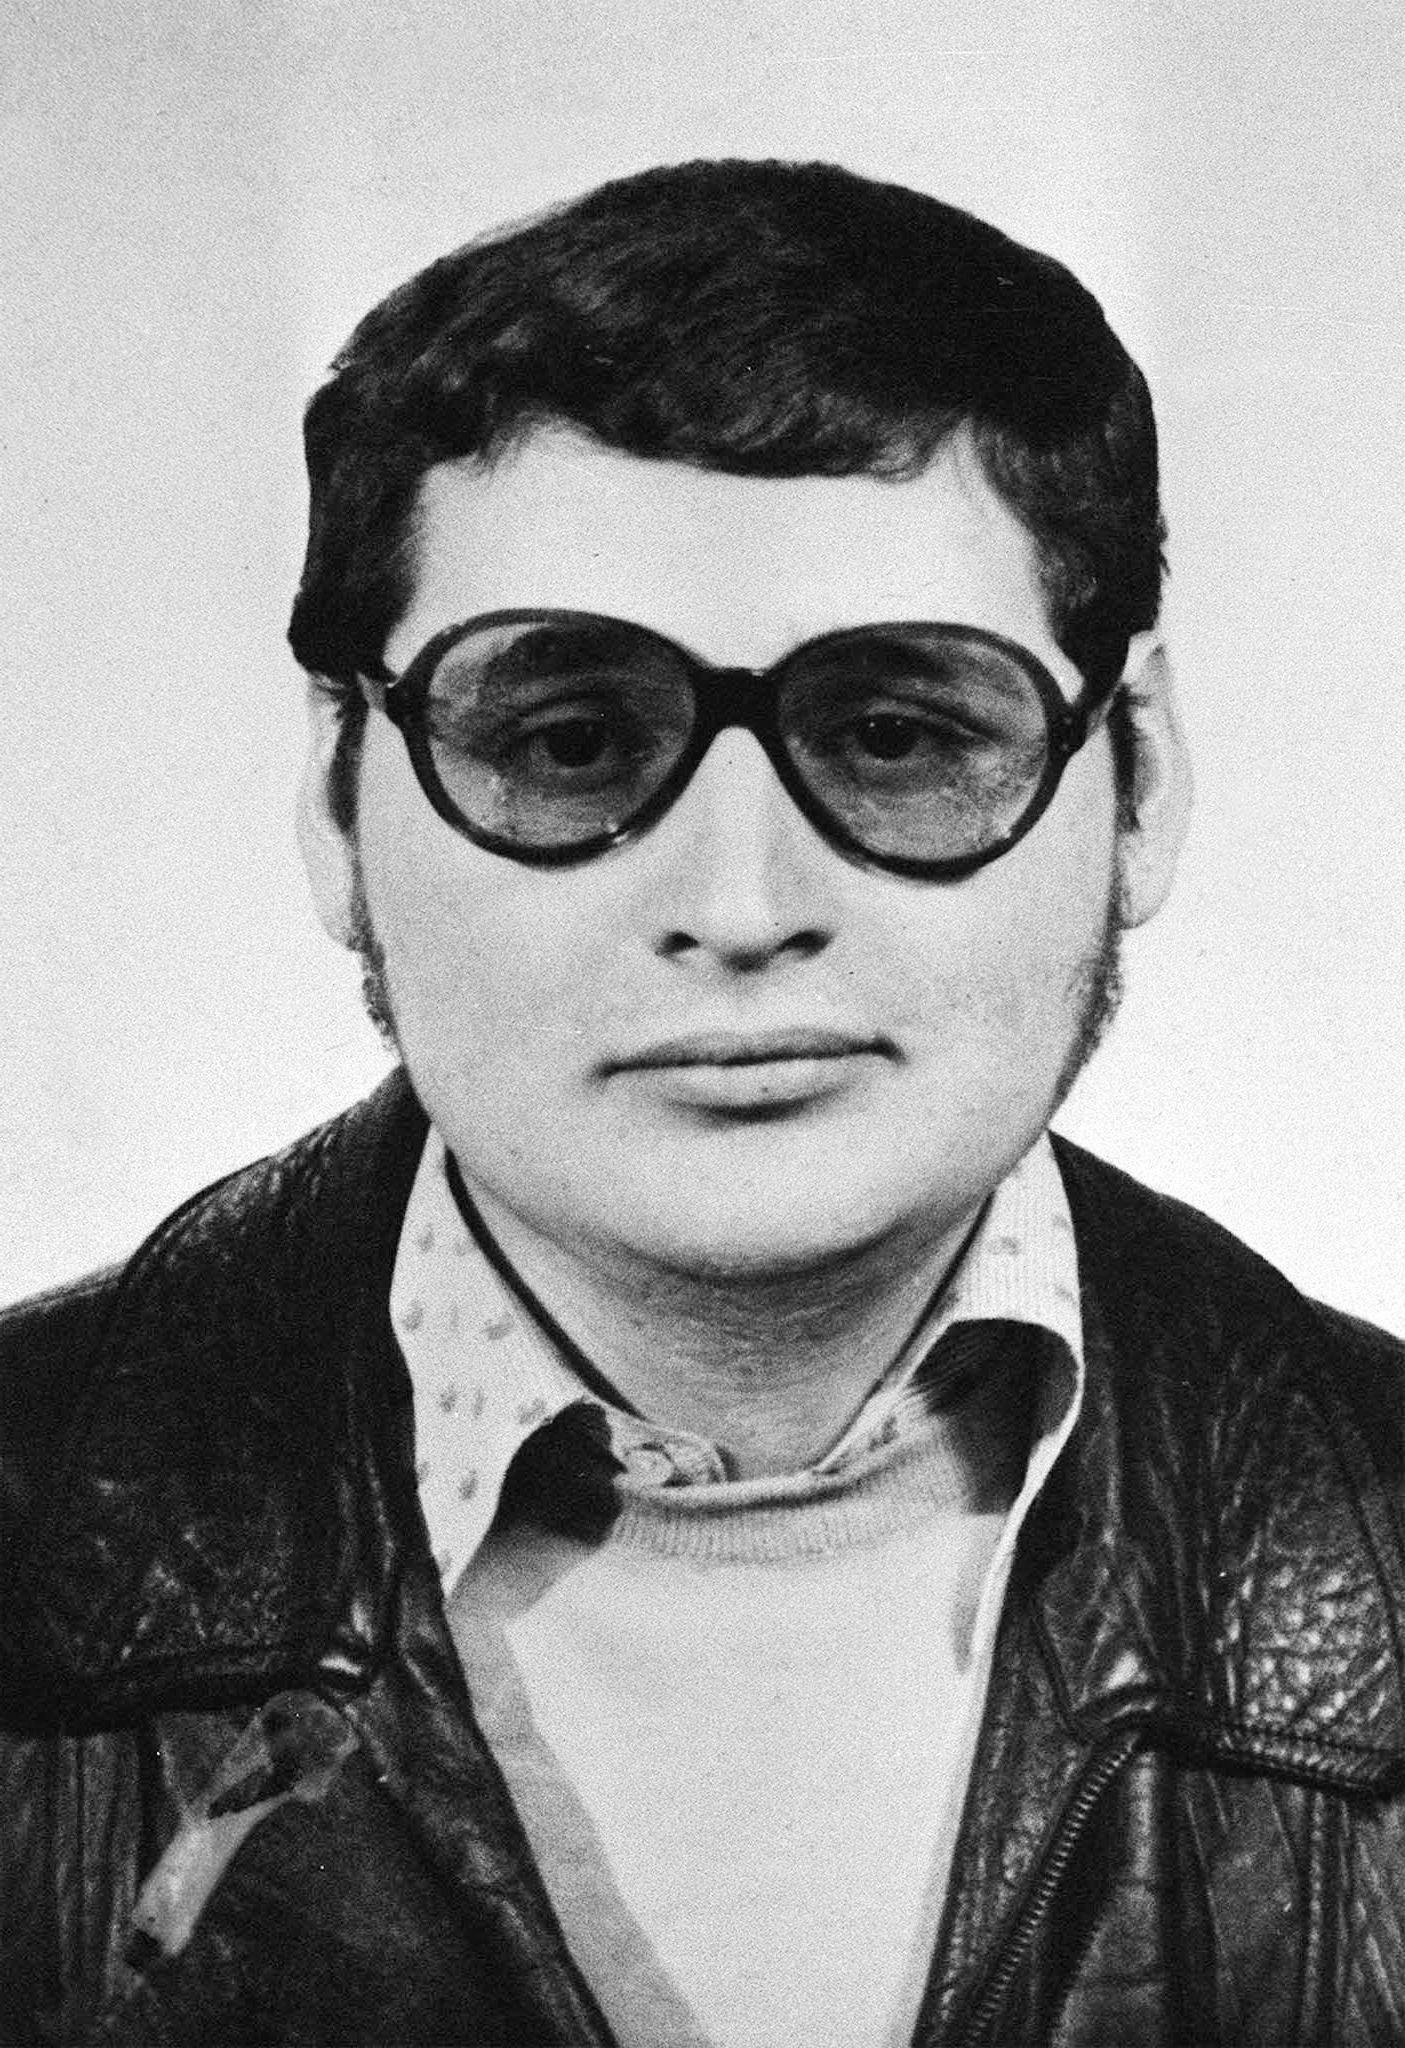 Ilich Ramírez Sánchez